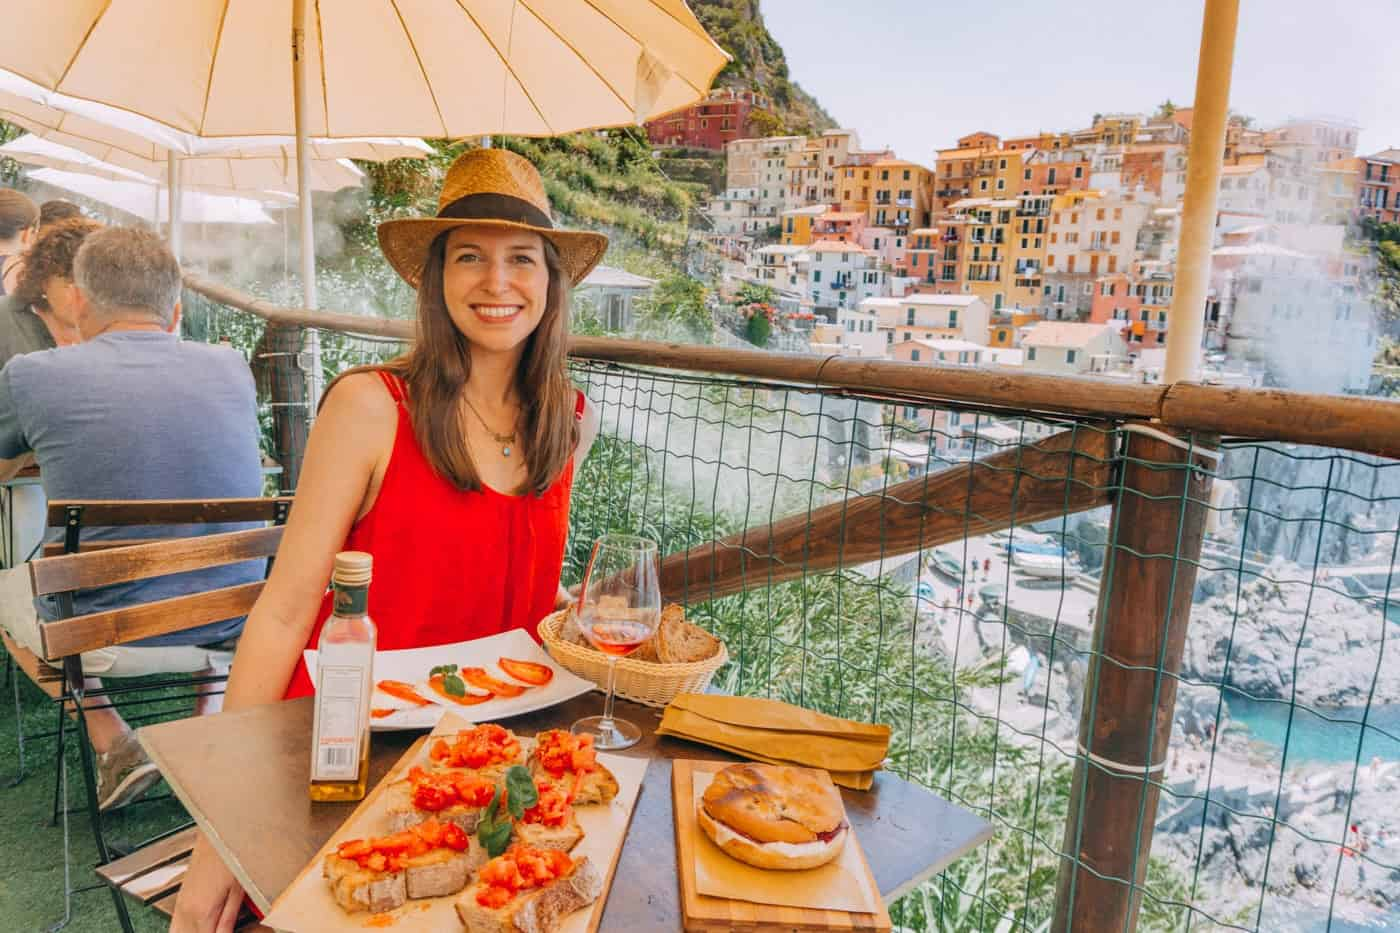 Lunch an Nessun Dorma in Manrola Italy